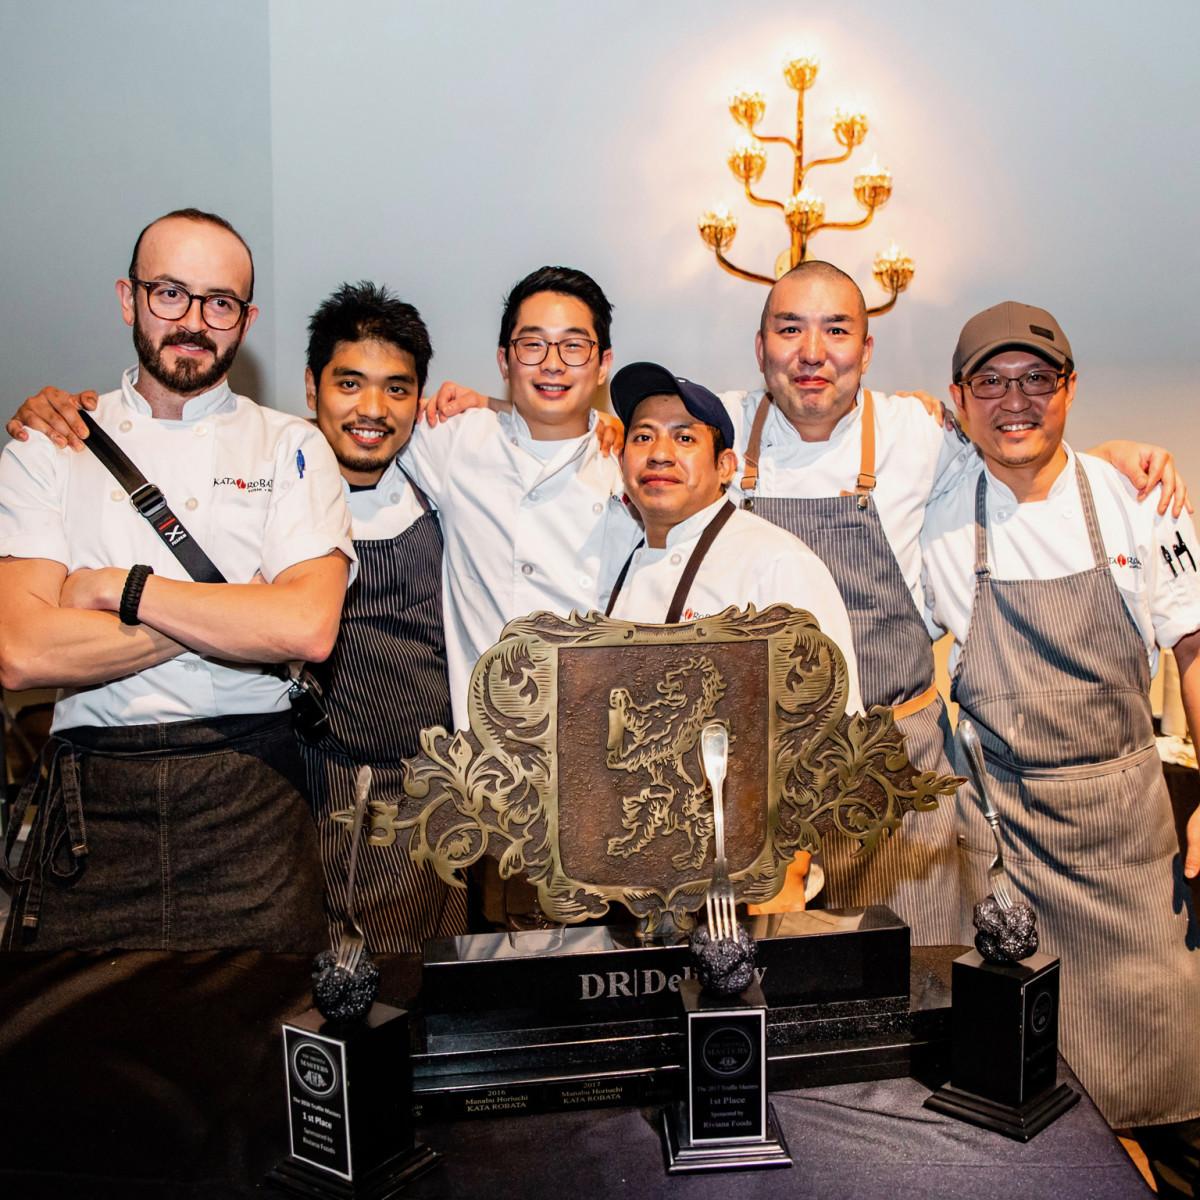 The Truffle Masters 2019 Kata Robata